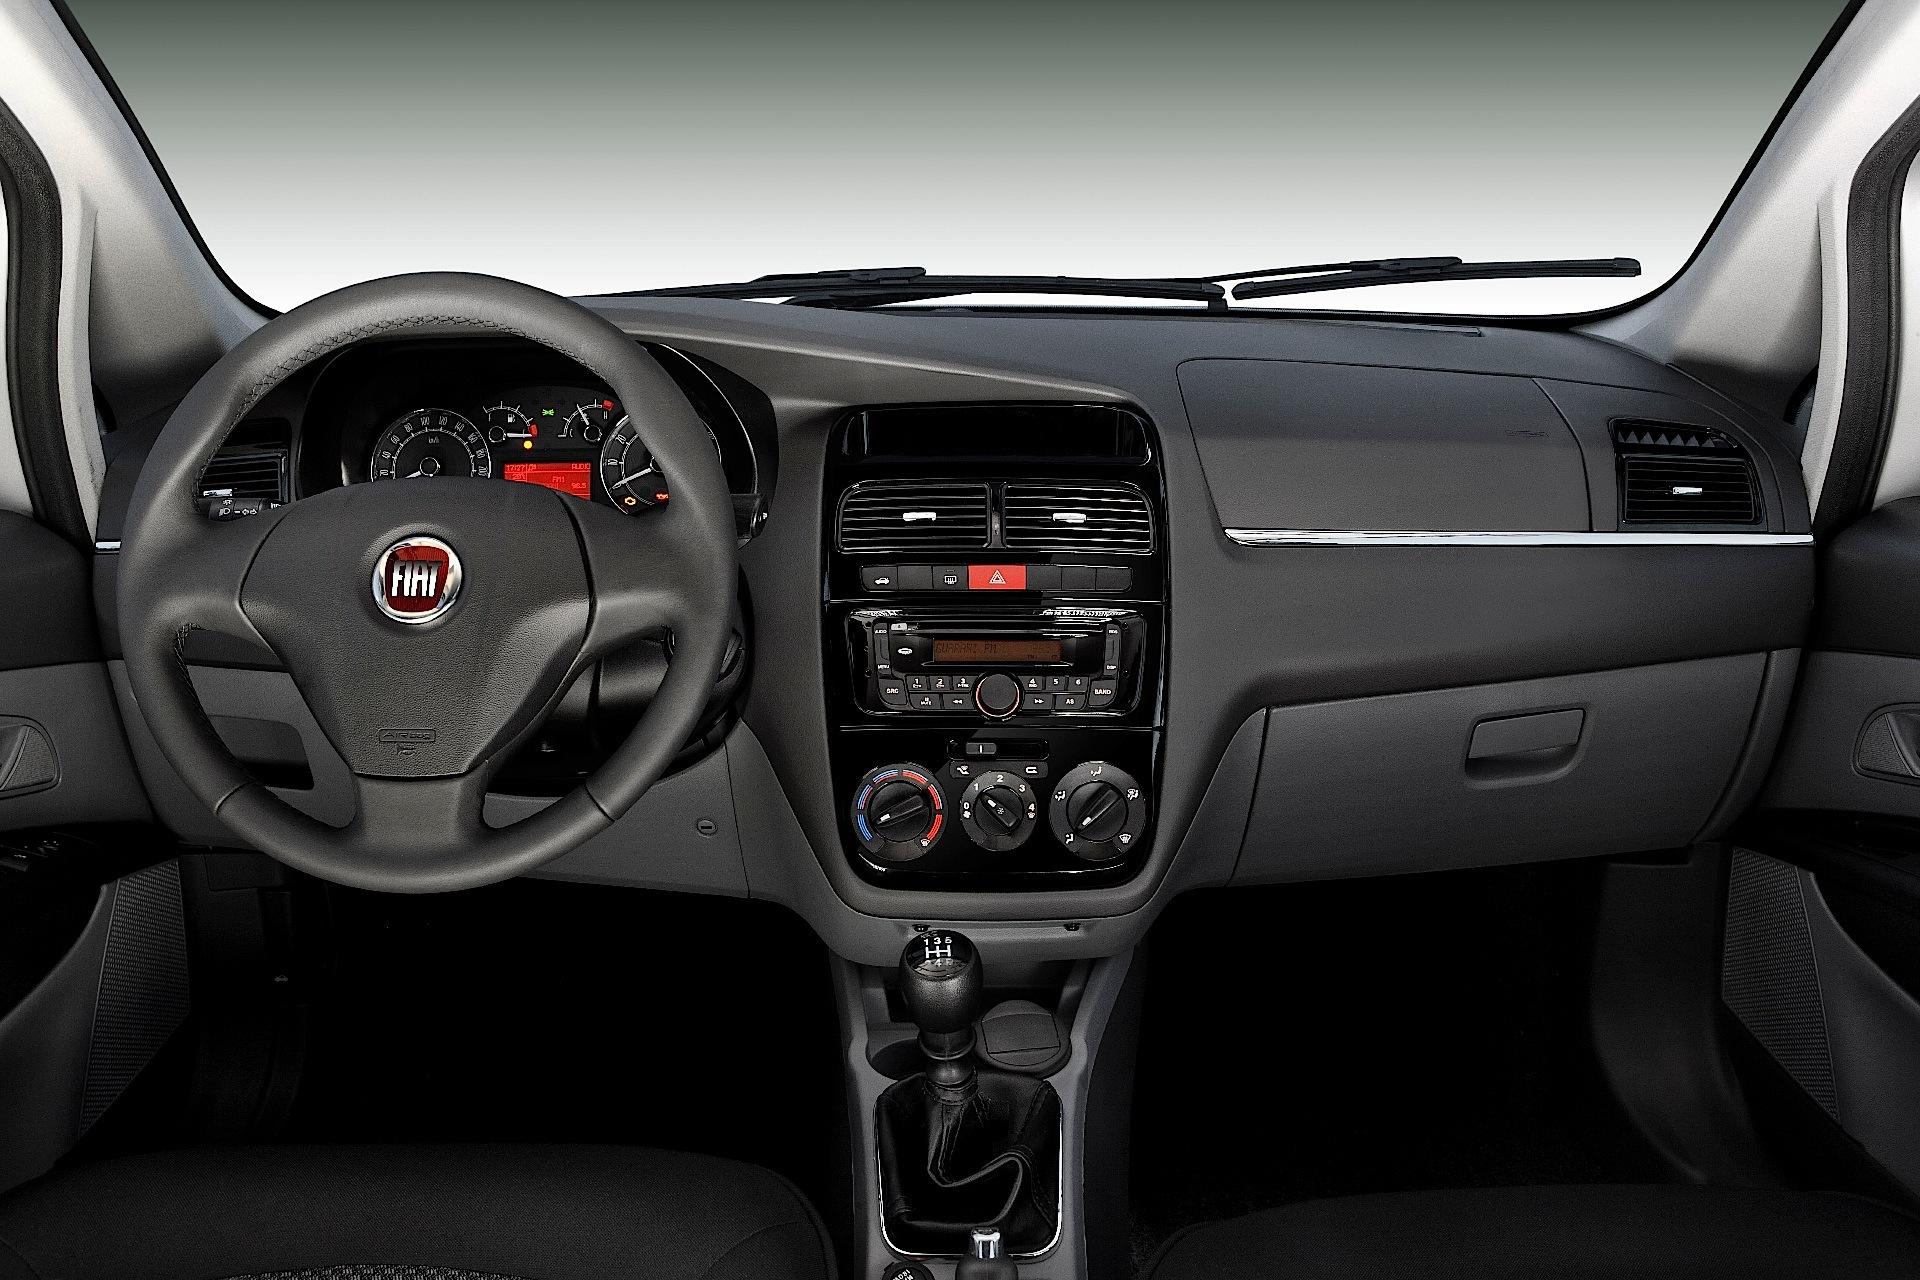 Fiat Linea on Range Rover Engine